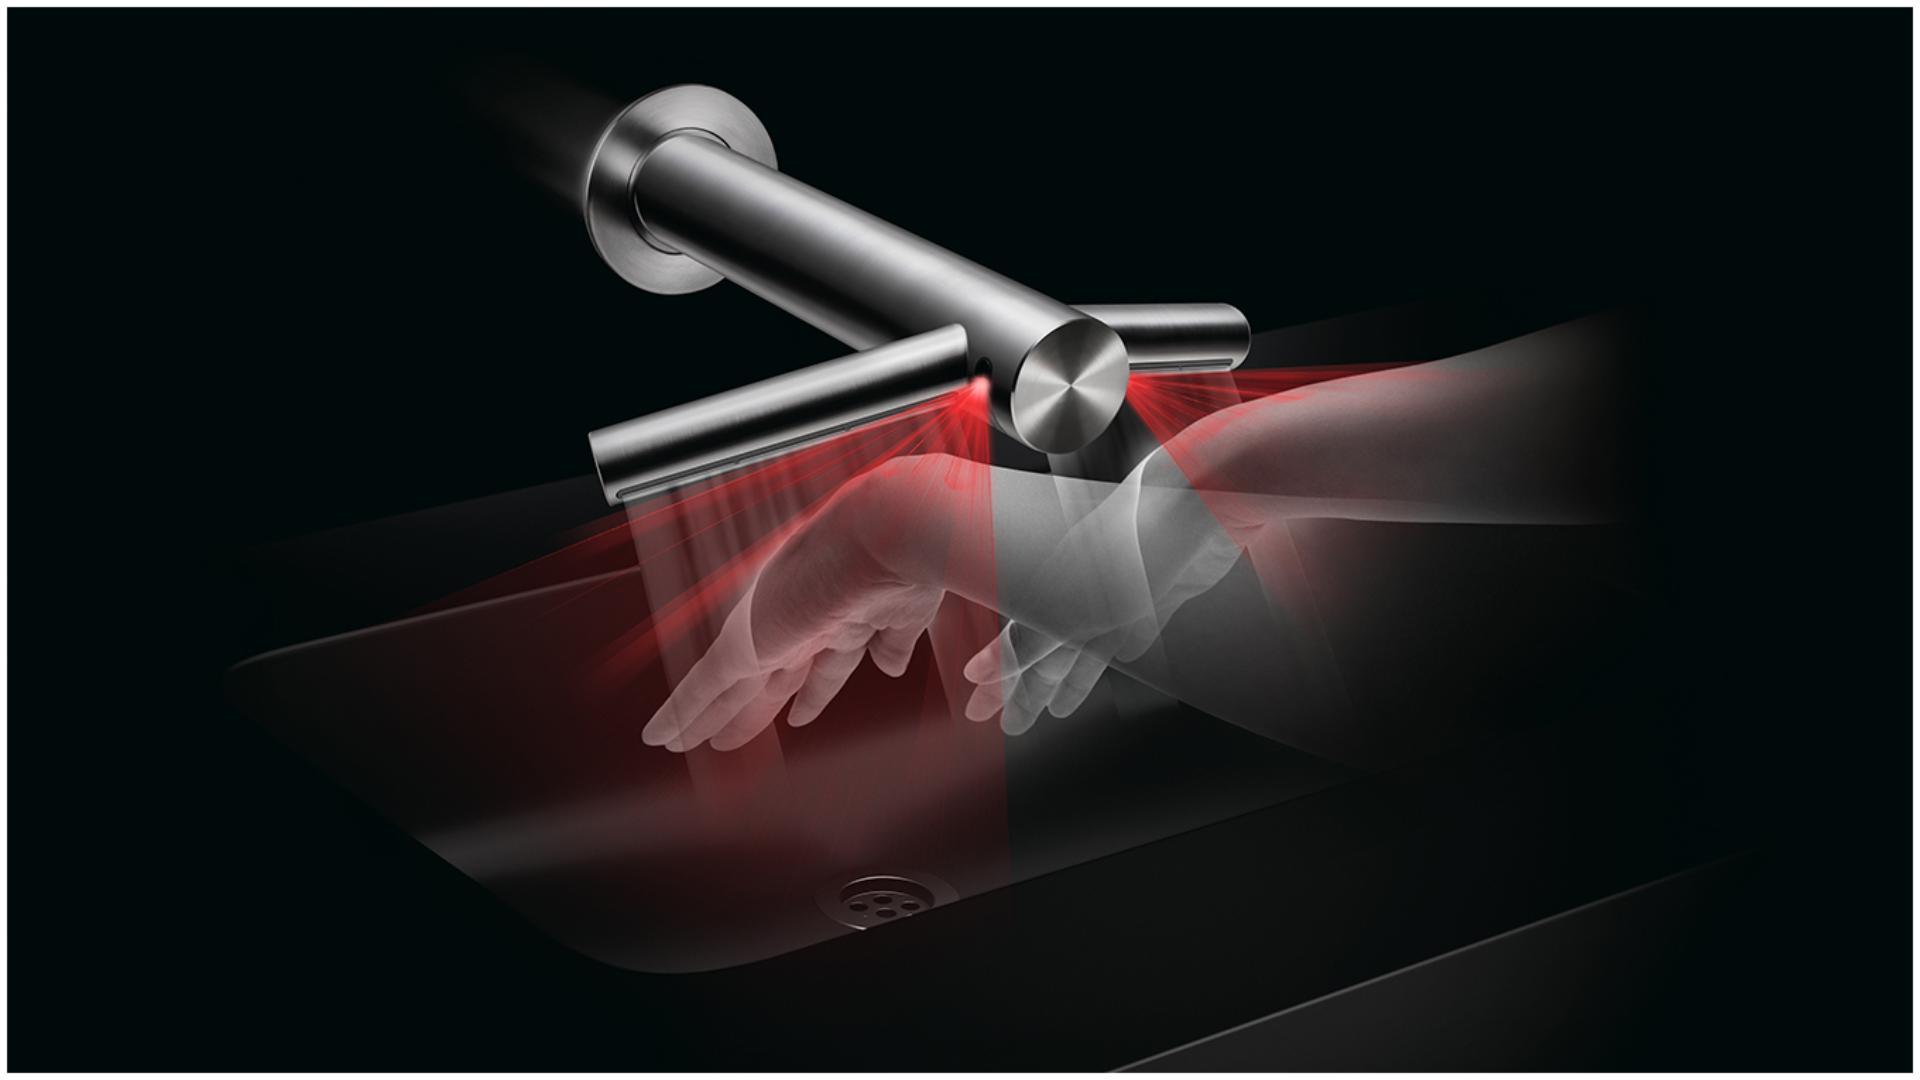 Tehnologia senzorilor de la uscător de mâini Airblade Wash+Dry